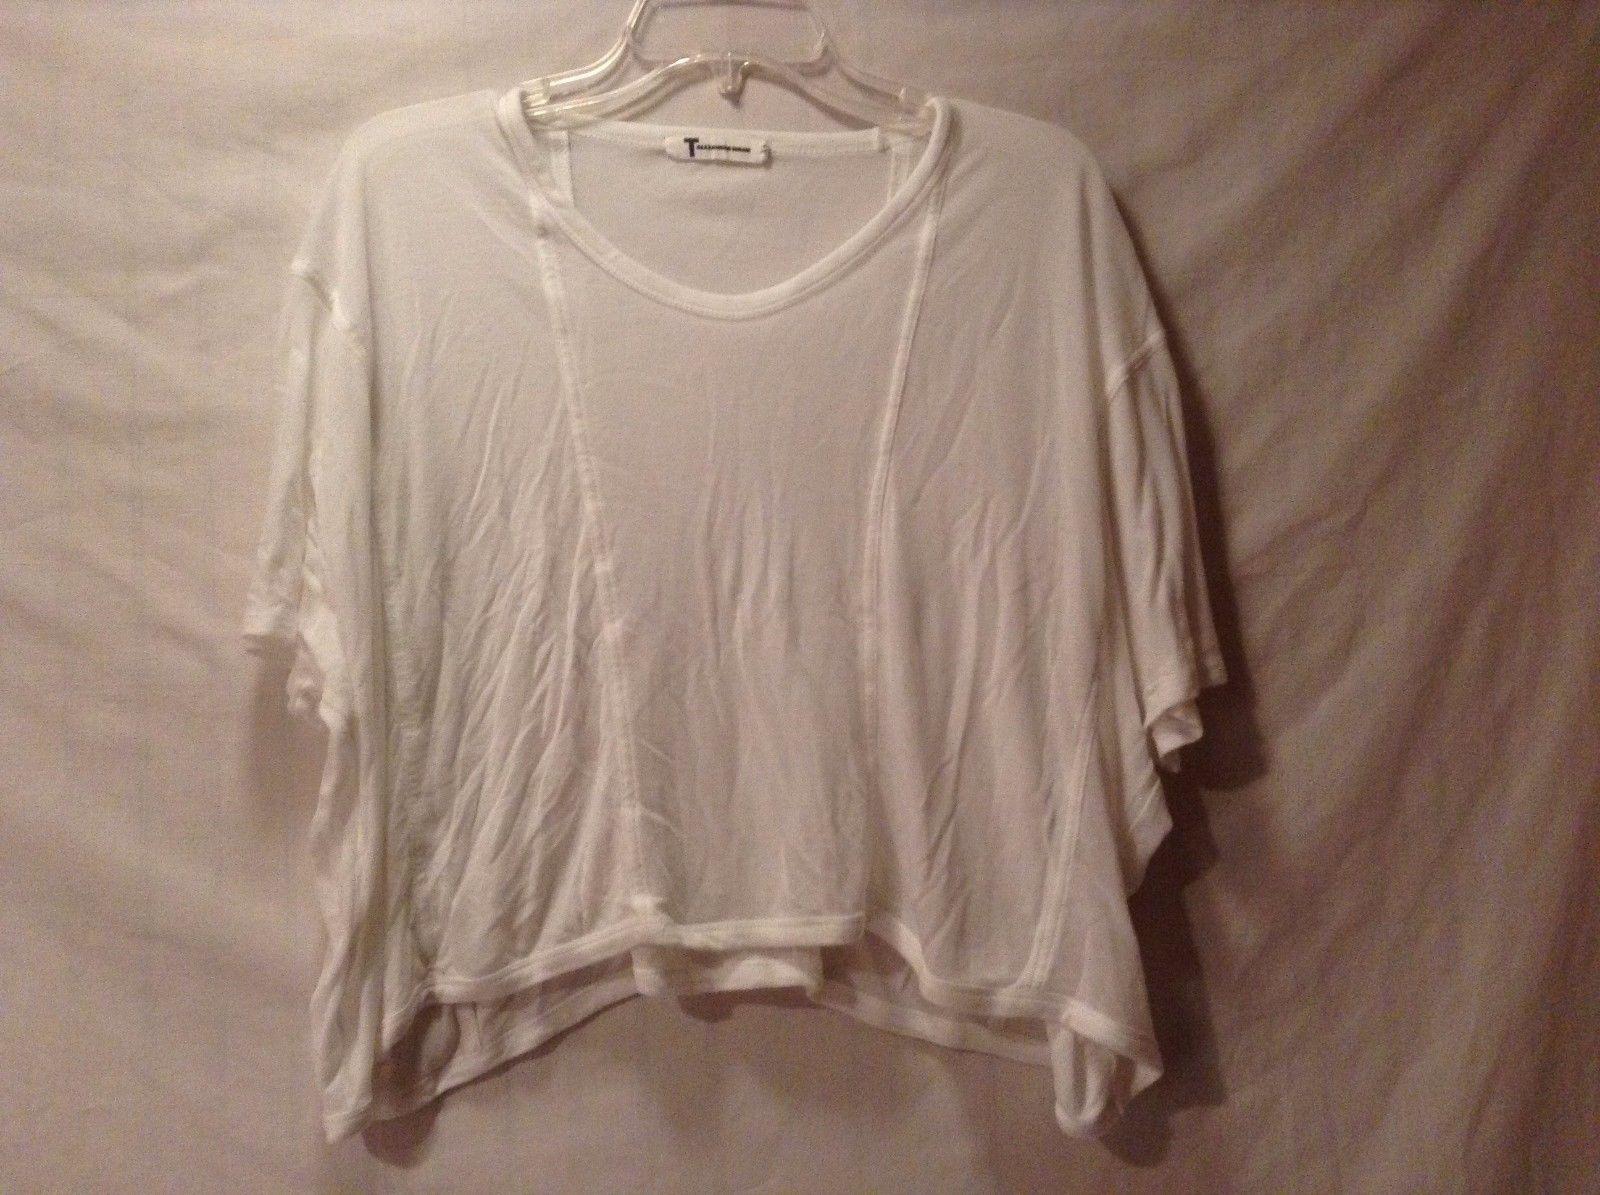 Great Condition T Alexander Wang White Sheer Shirt